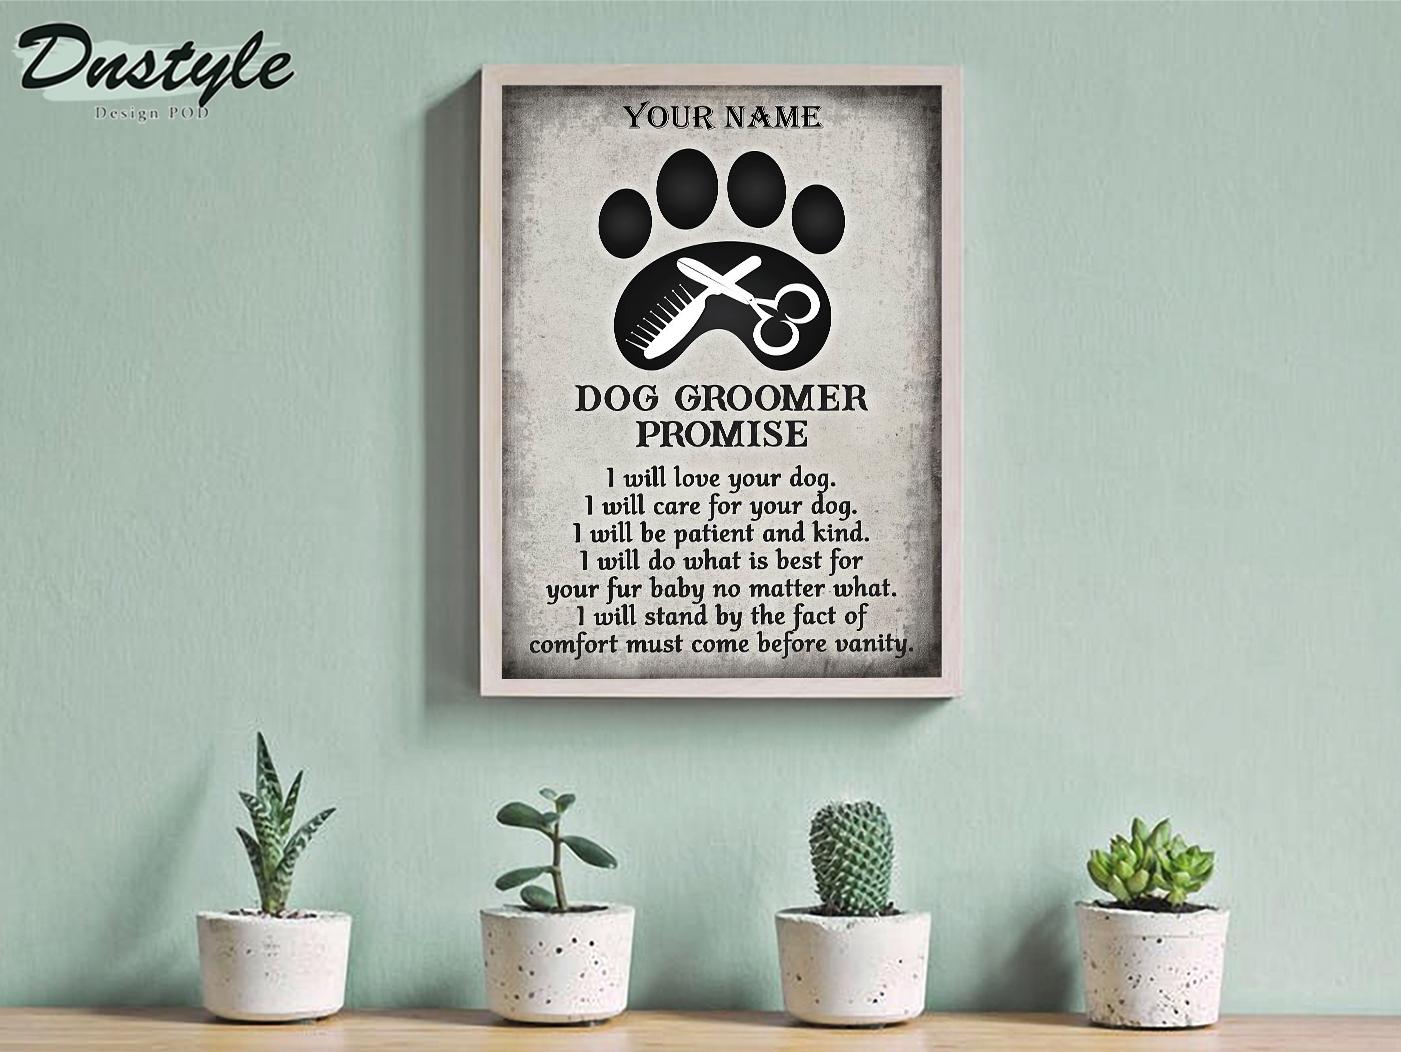 Personalized custom name dog groomer promise poster